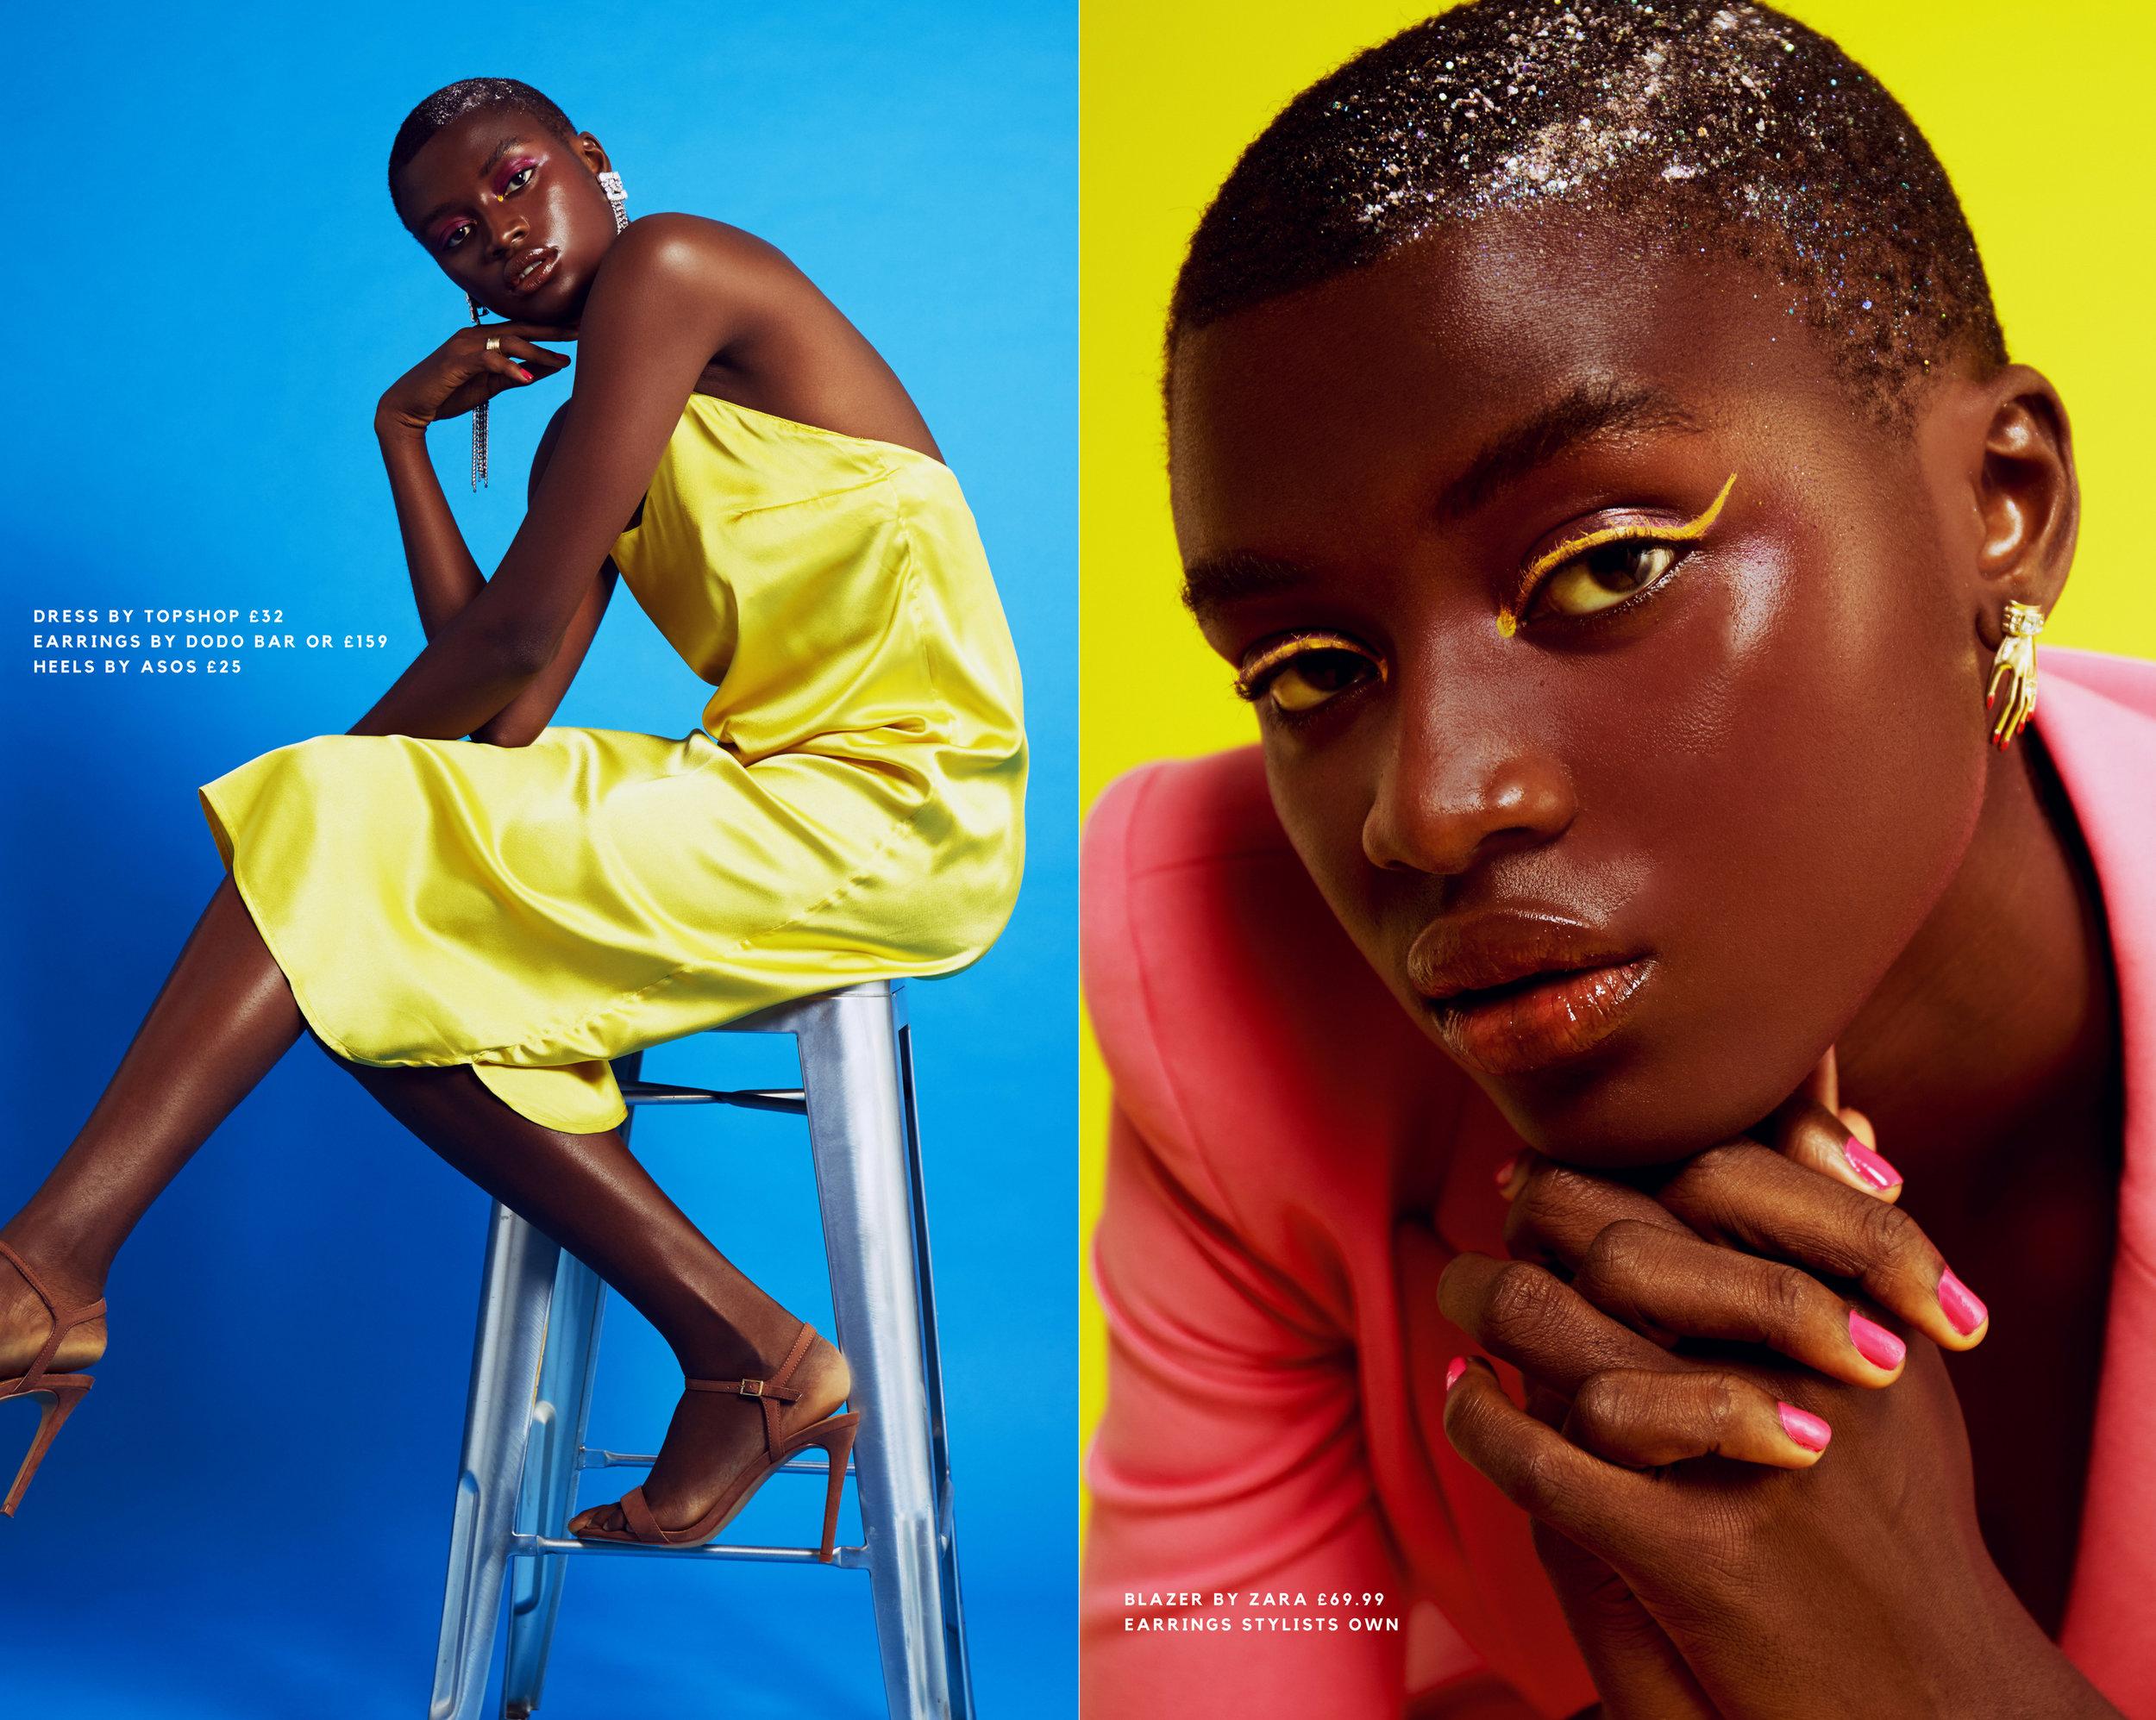 Bold+Beginnings+Fashion+Editorial+2.jpg